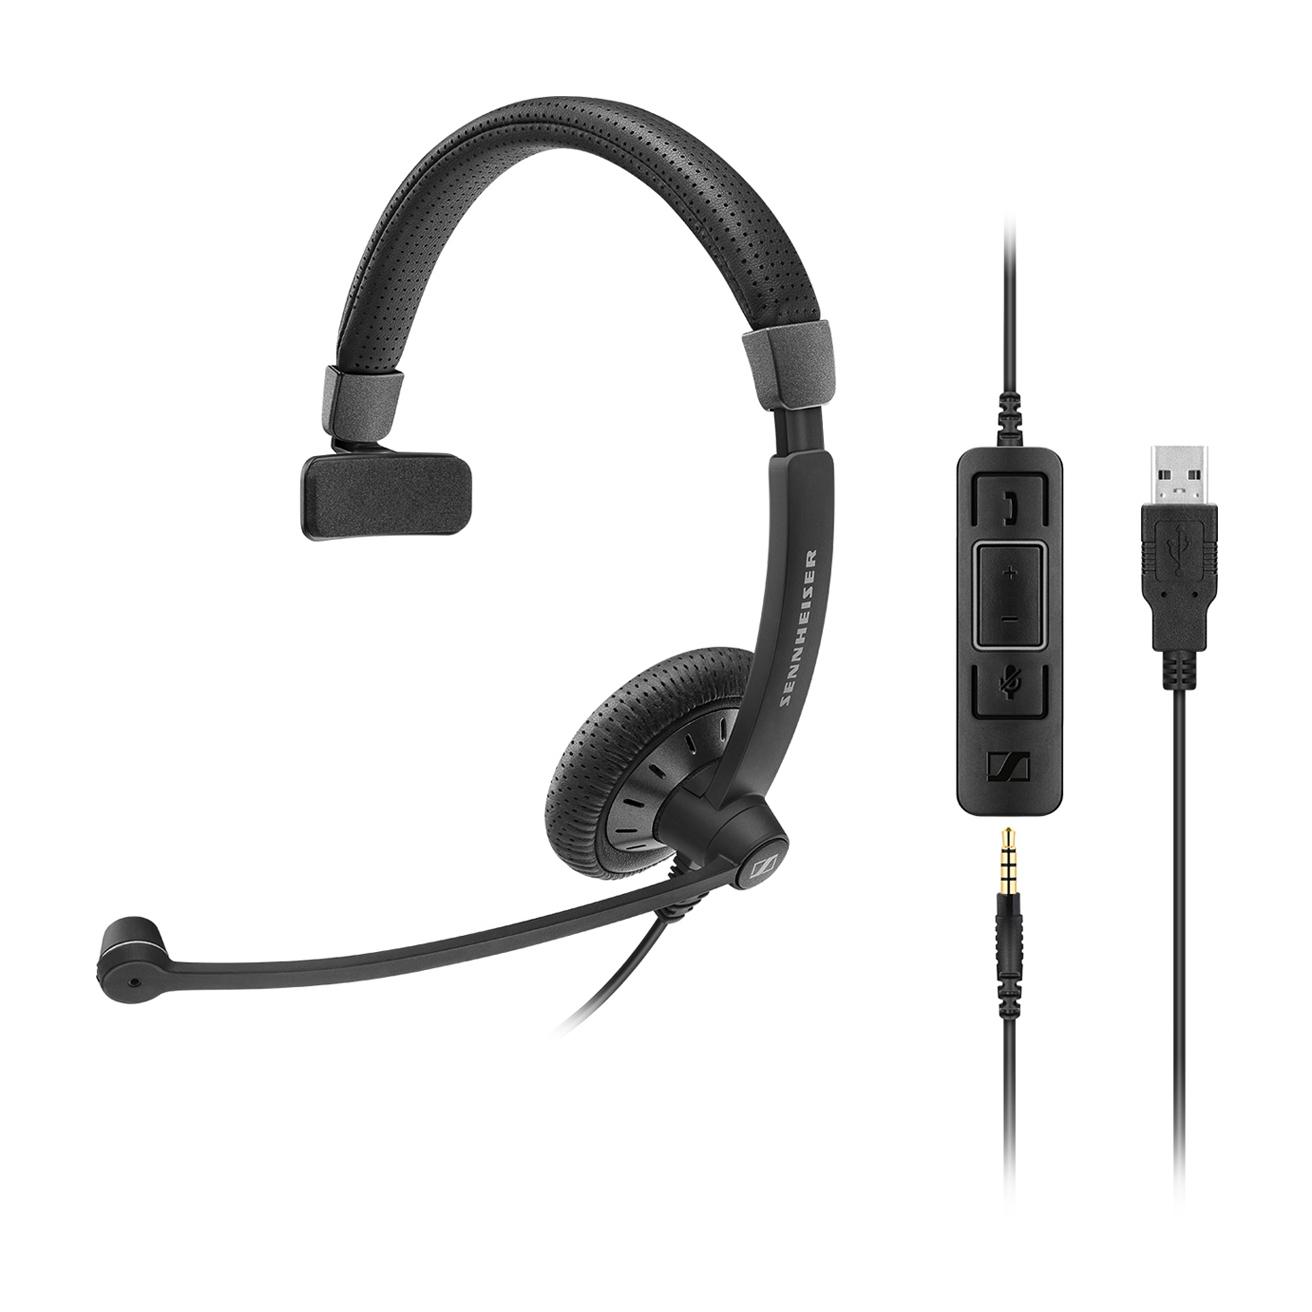 Image of Sennheiser SC 45 MS 3.5mm & USB-A Mono Corded Headset